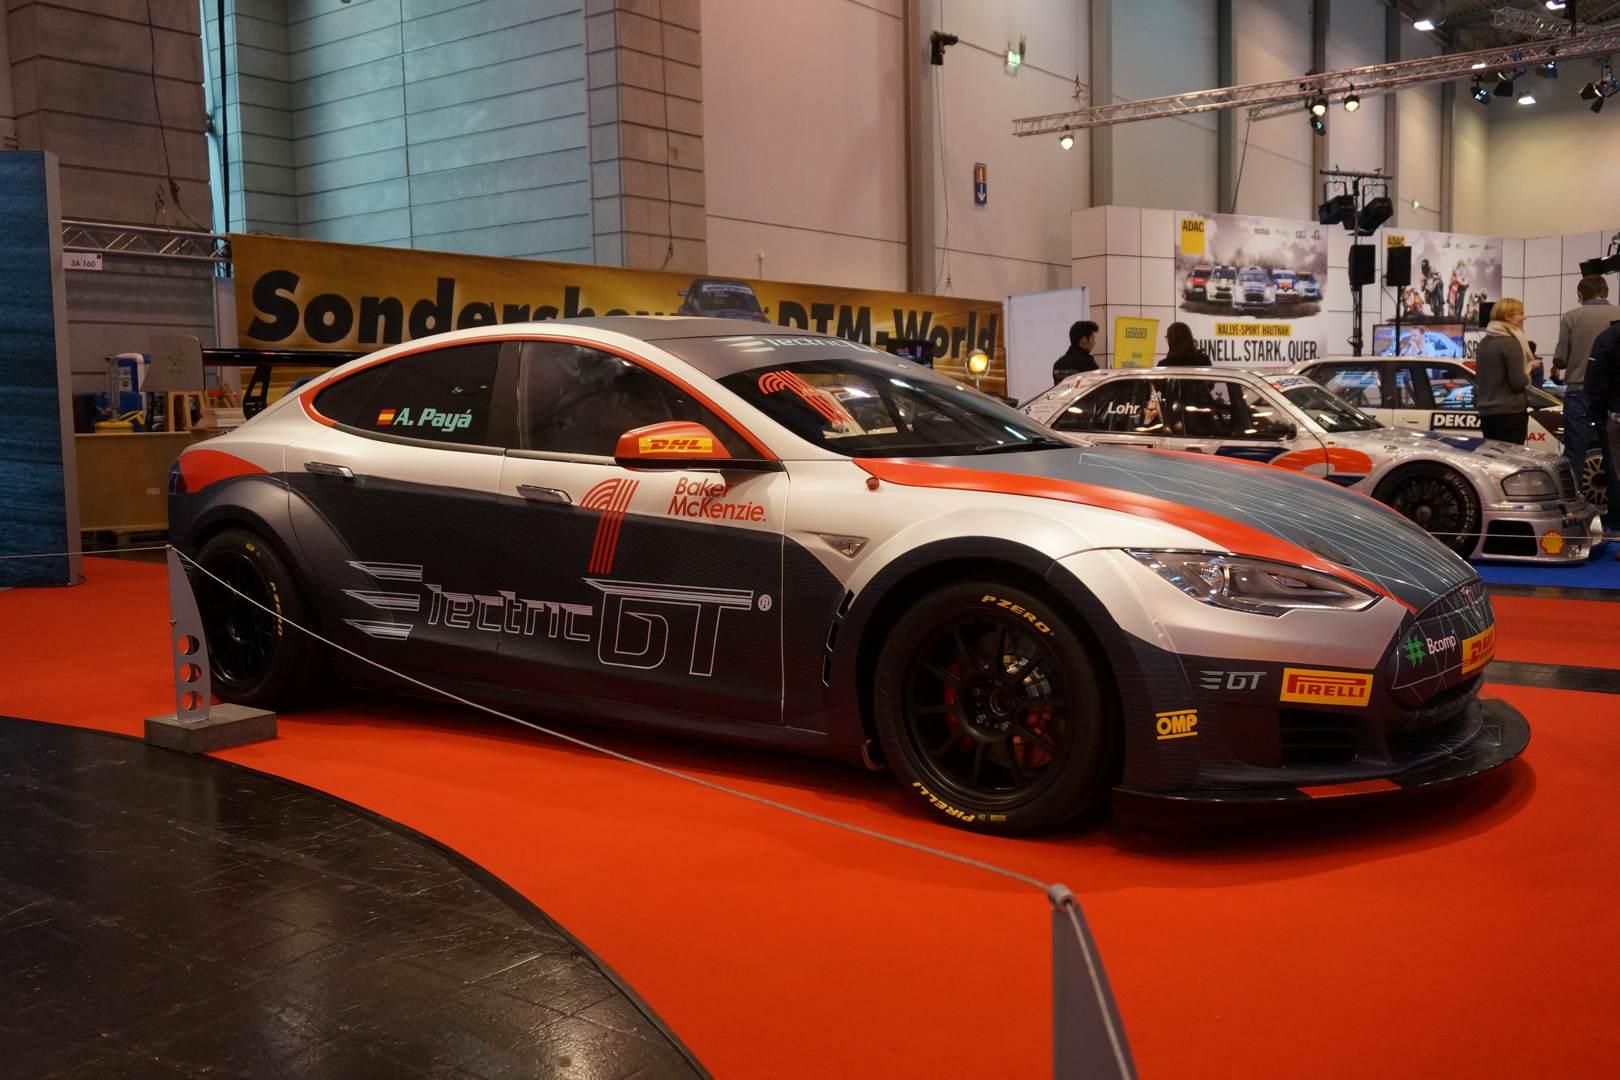 Electric GT mit Tesla Model S